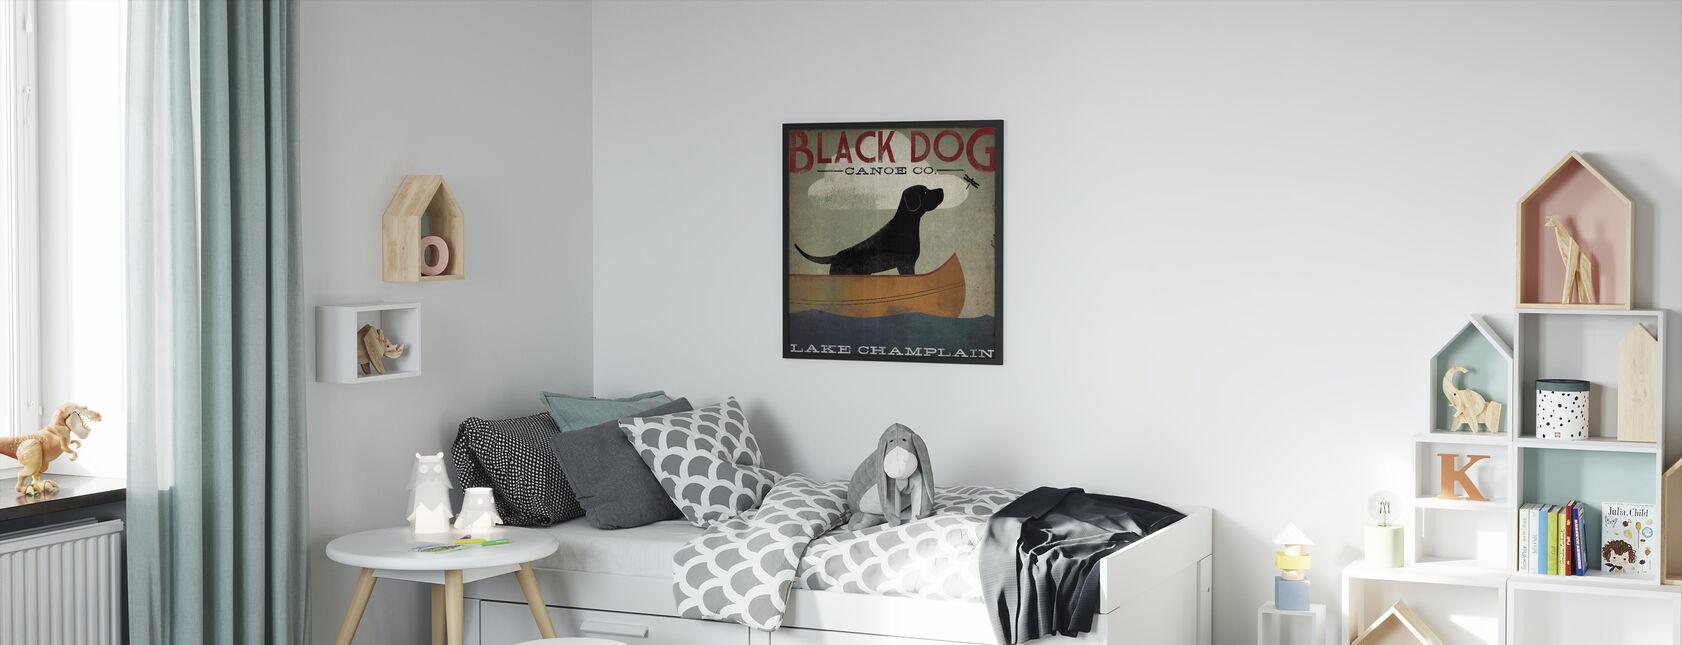 Black Dog Lake Champlain - Print enmarcado - Cuarto de niños